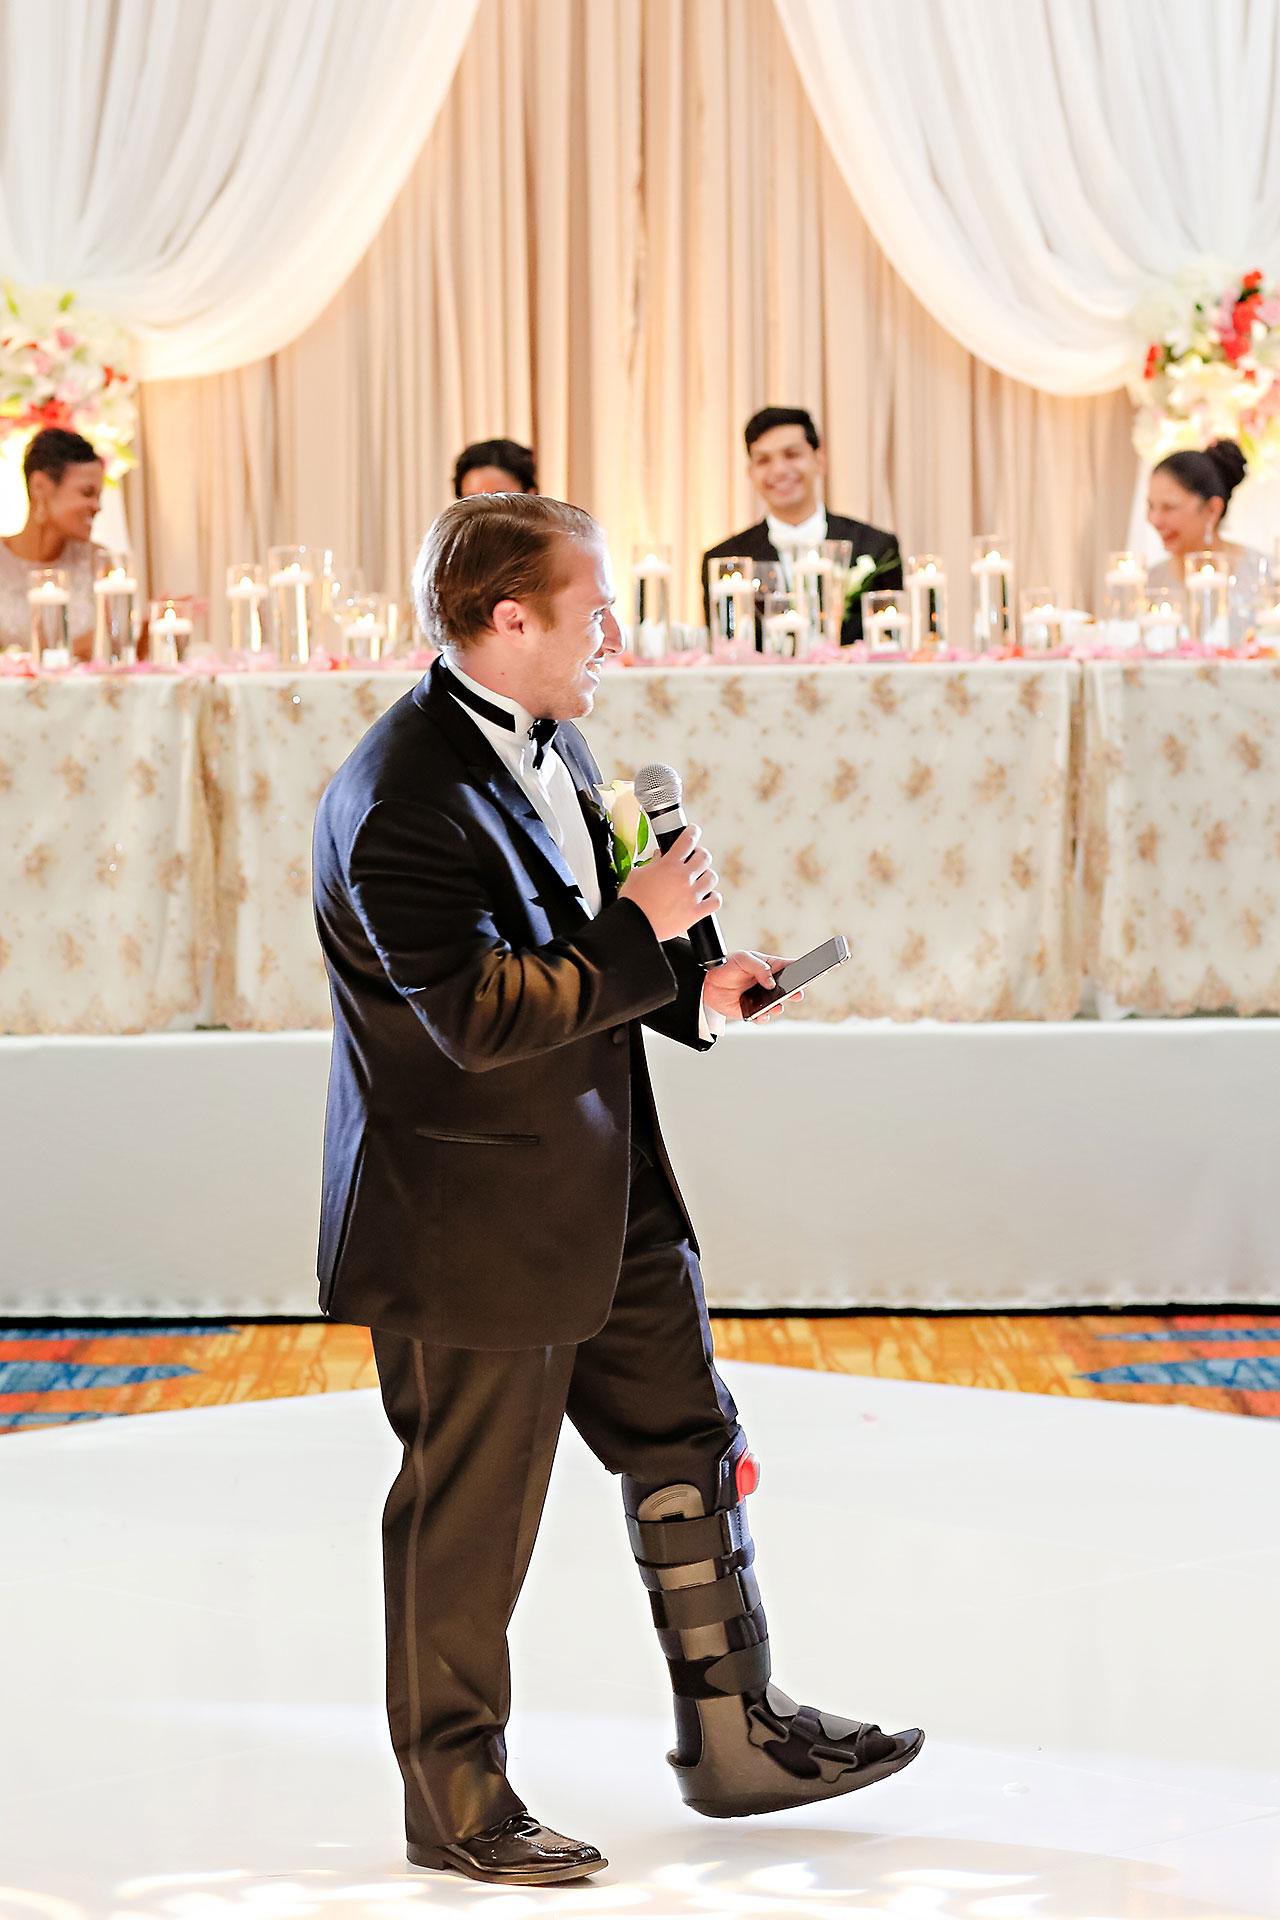 Joie Nikhil JW Marriott Indianapolis Wedding 098